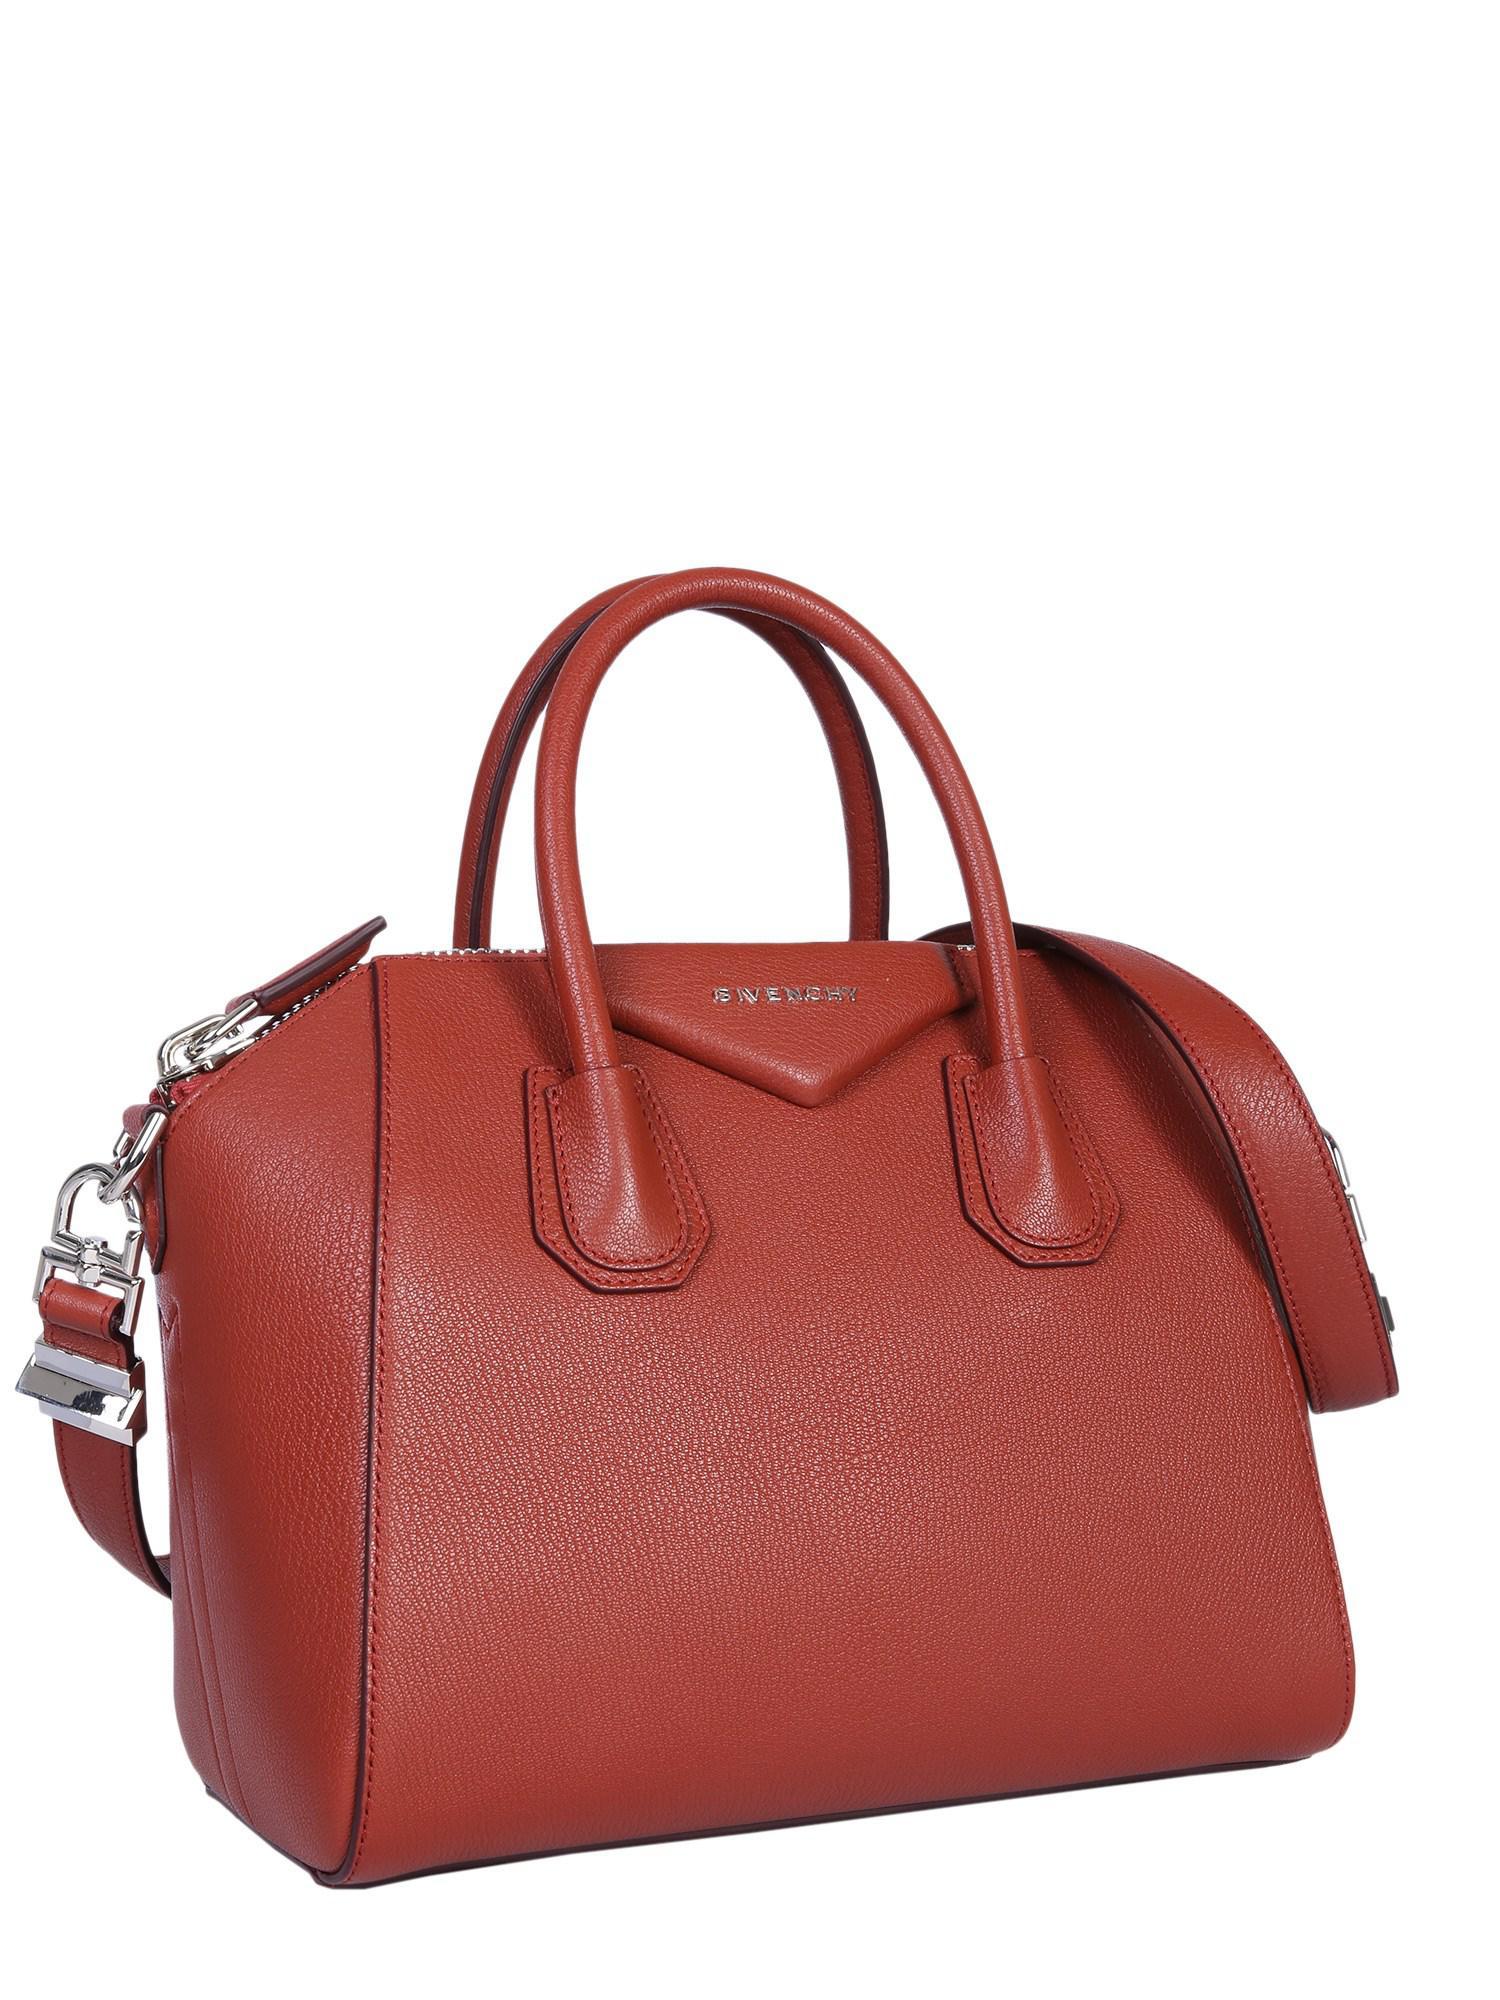 Givenchy - Brown Small Antigona Leather Bag - Lyst. View fullscreen 7596d7d768